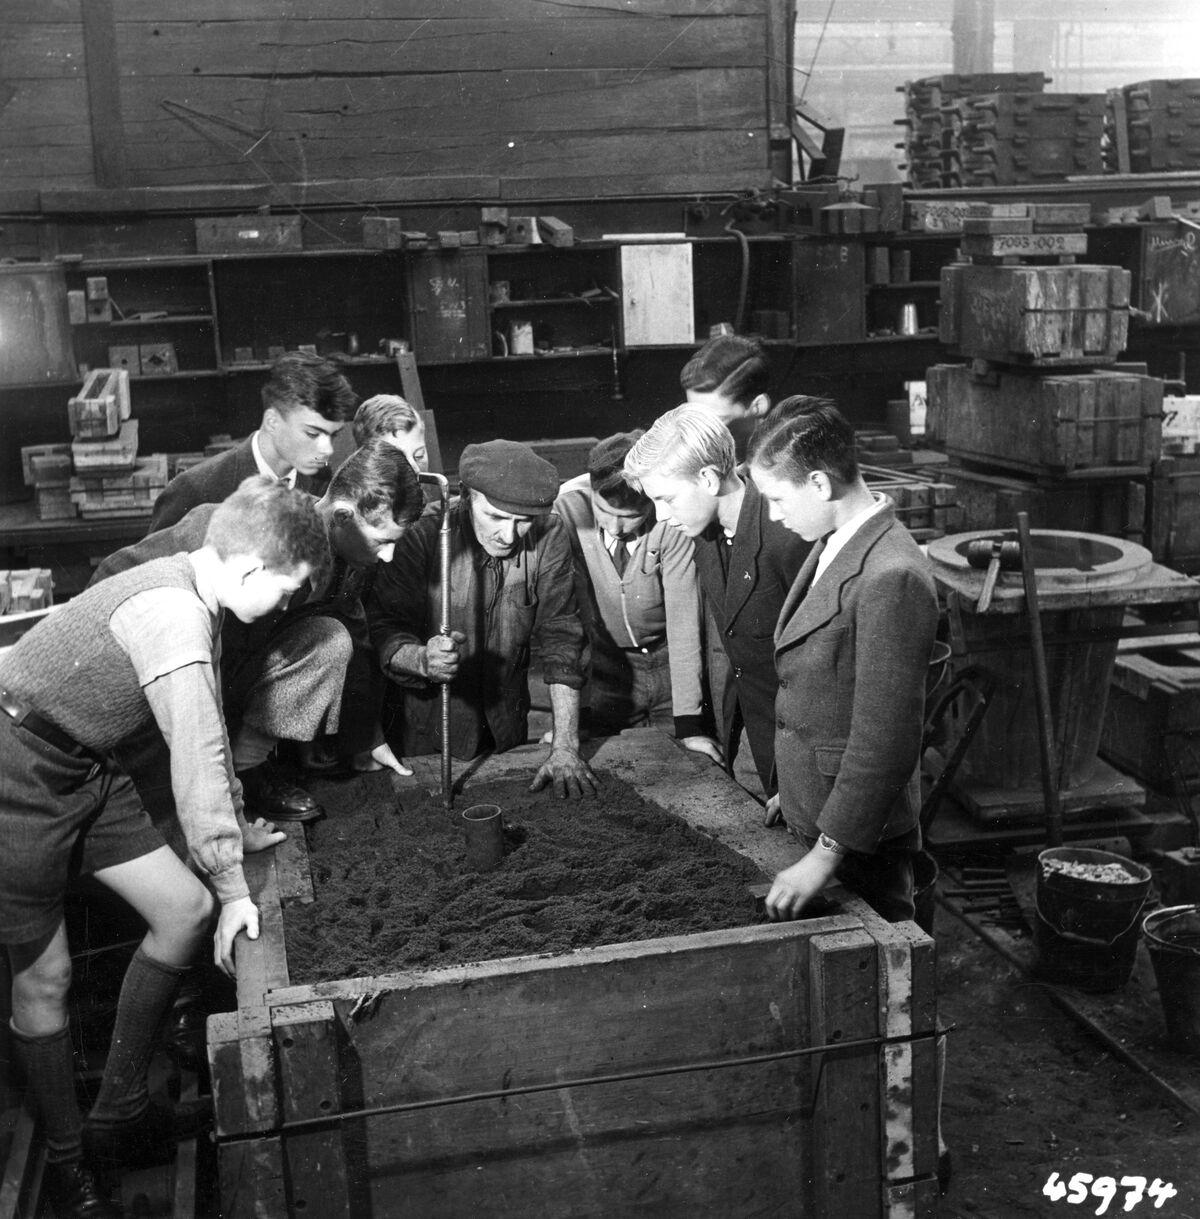 GFA 12/45974: Reportage casting process in malleable casting